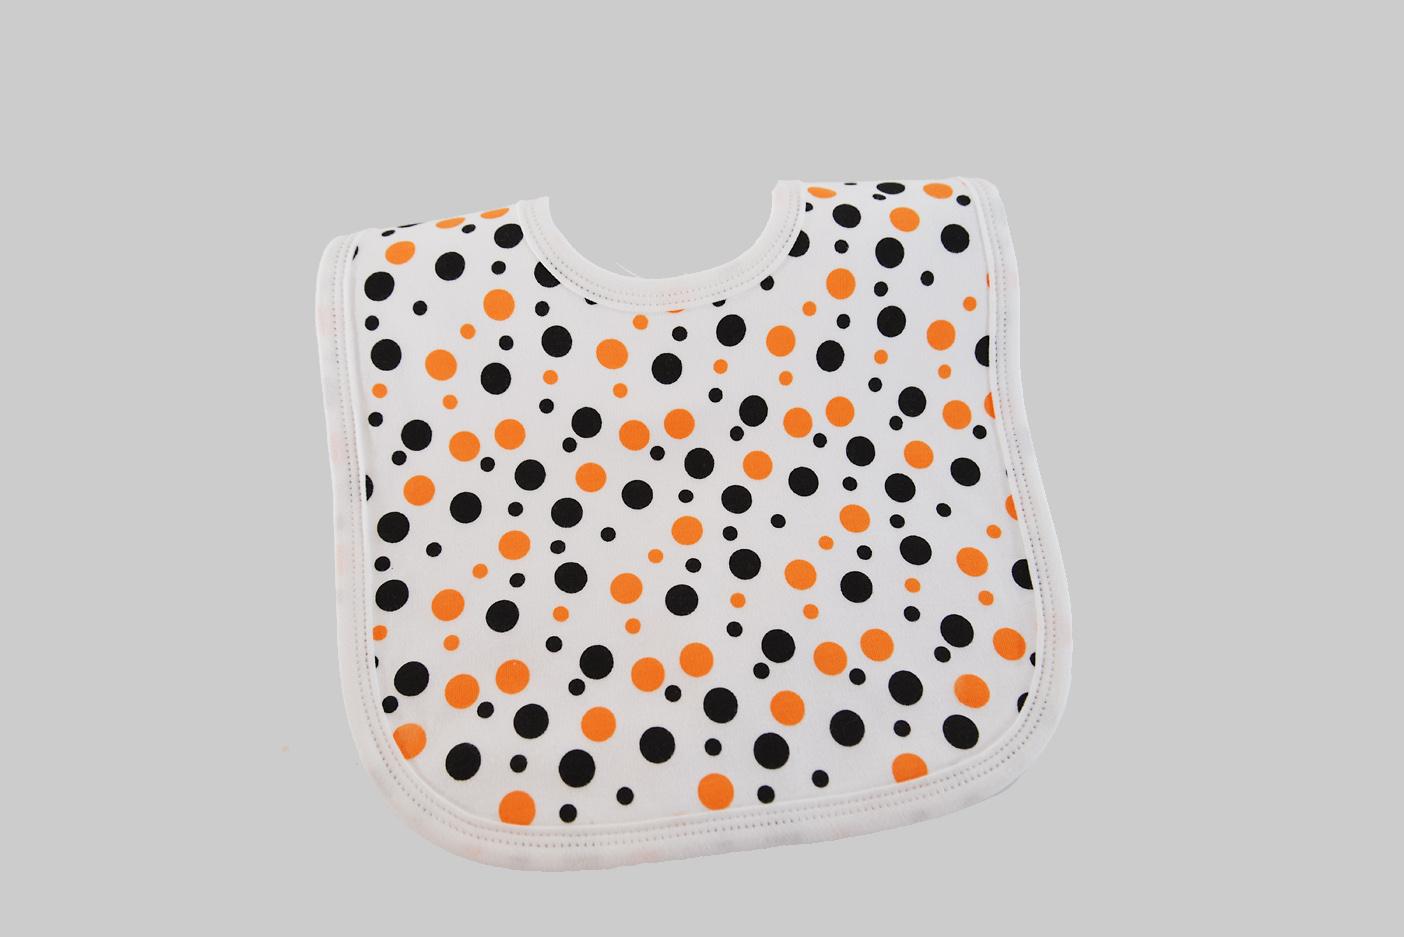 Orange & black dots, baby bib